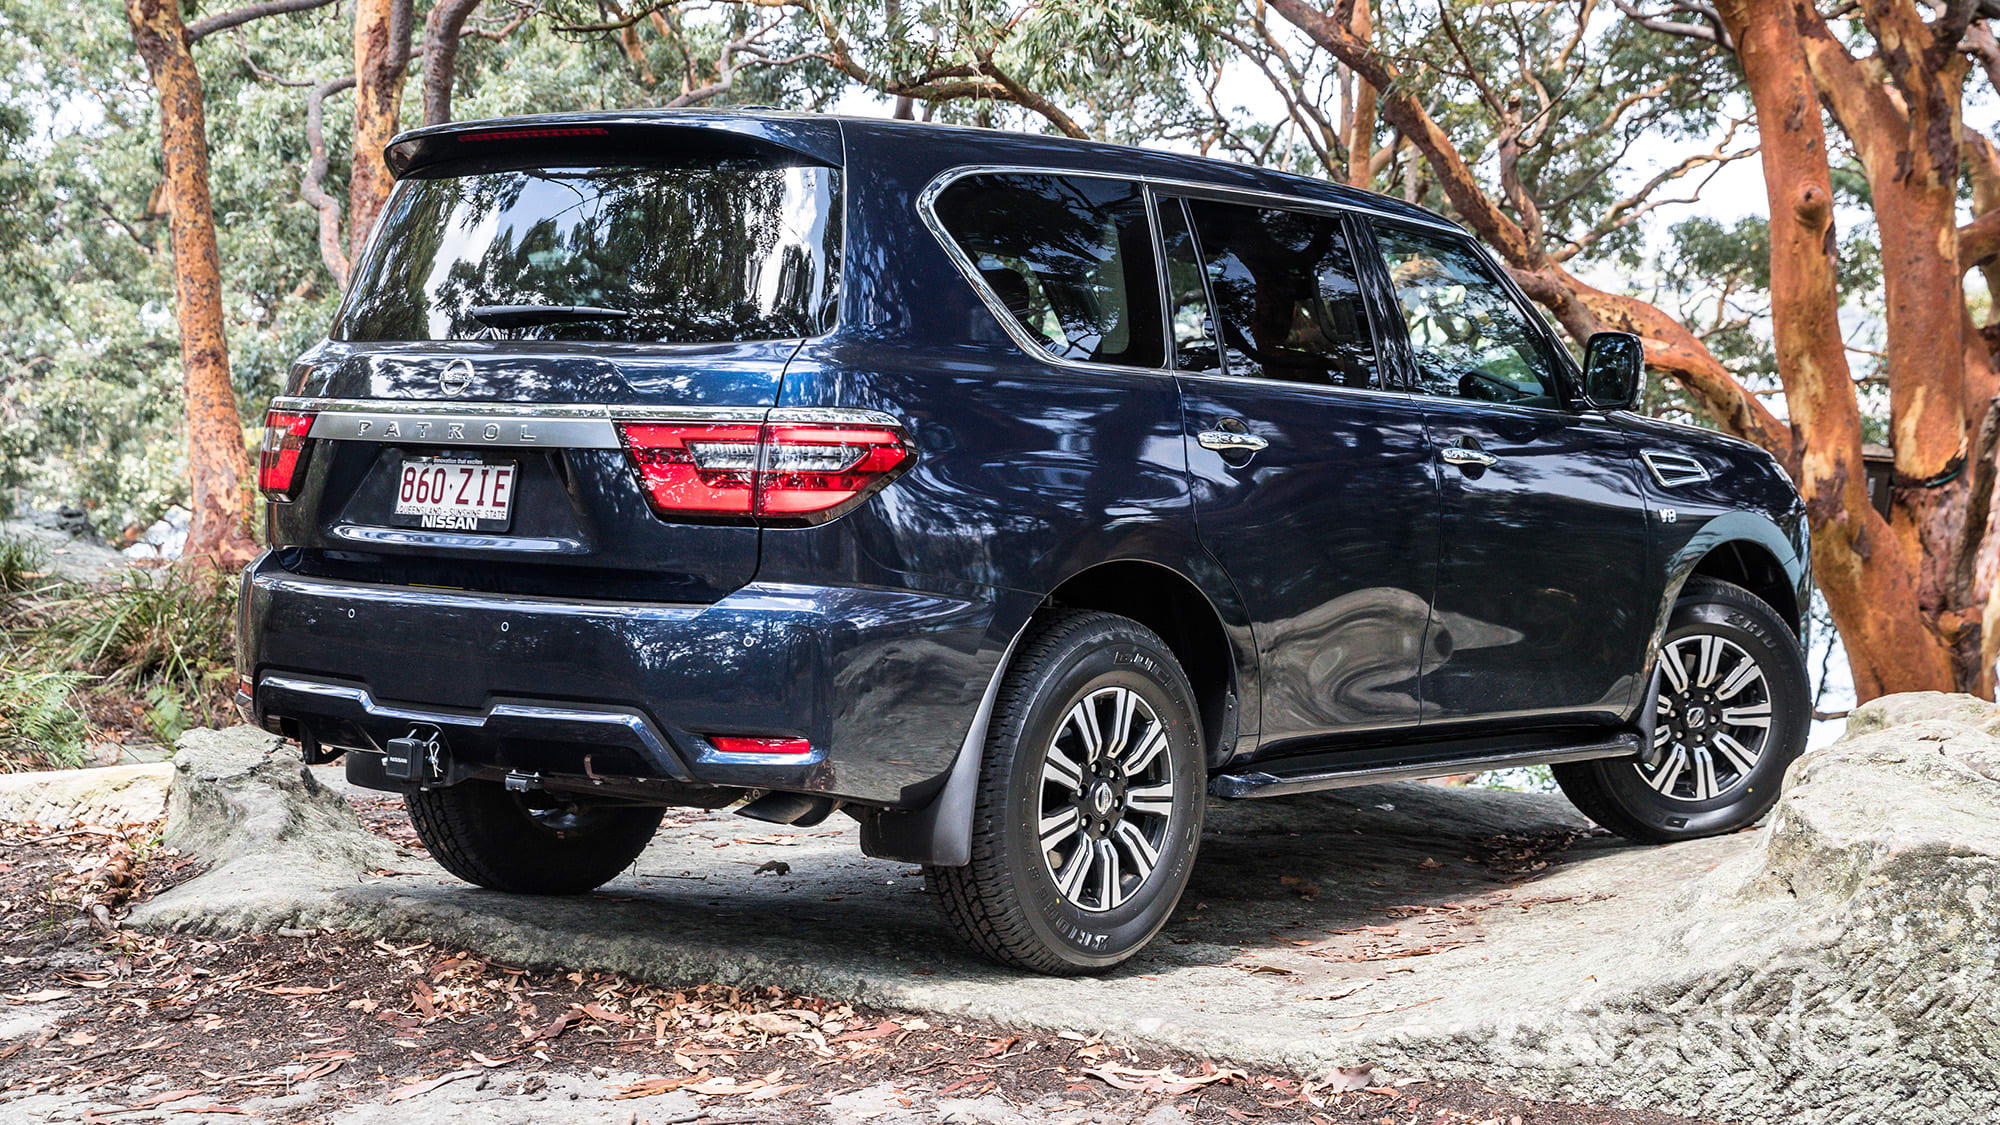 2021 nissan patrol facelift unveiled - update: australian